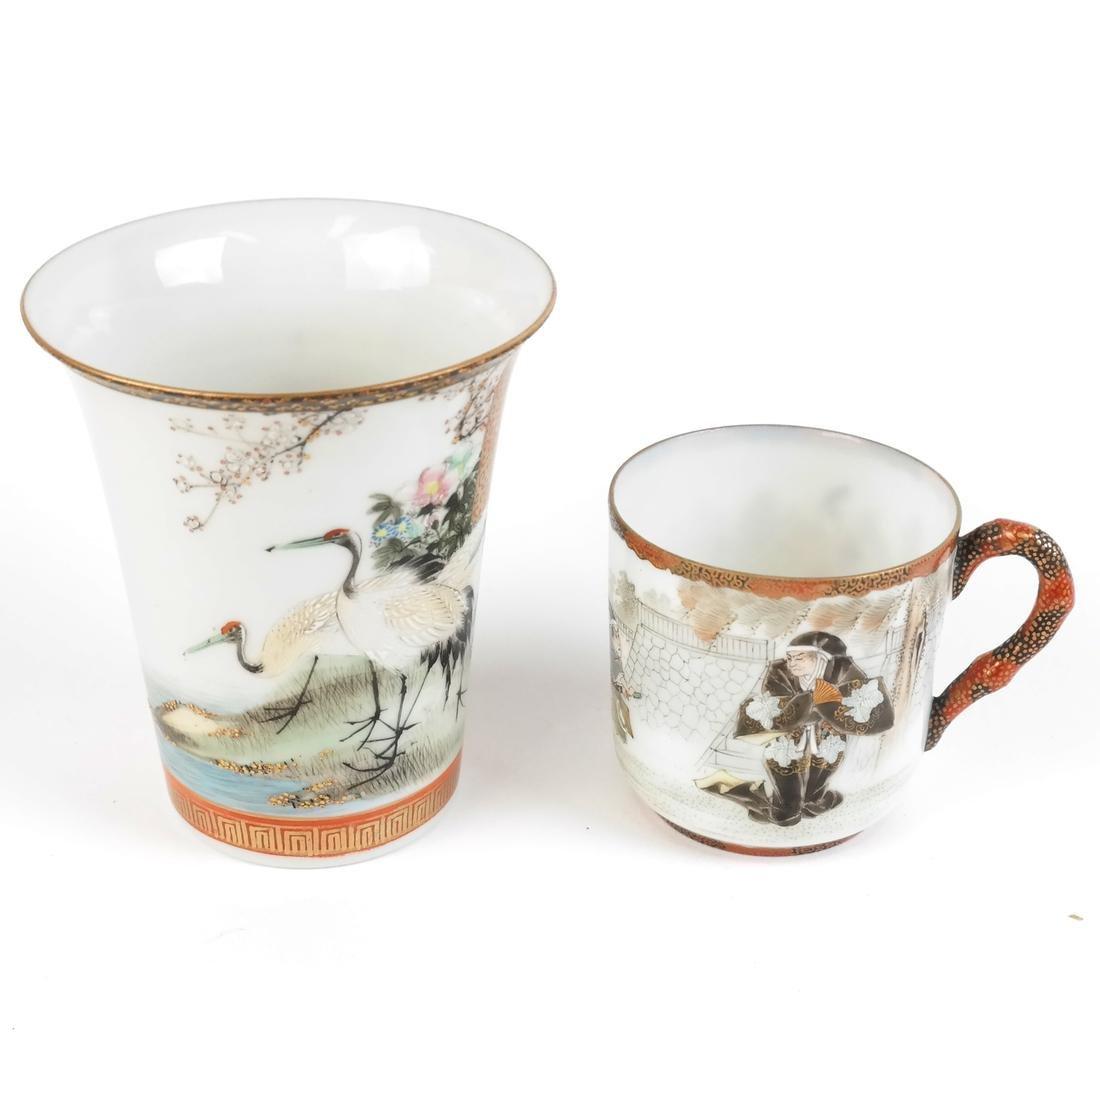 Five Japanese Porcelain Items - 2